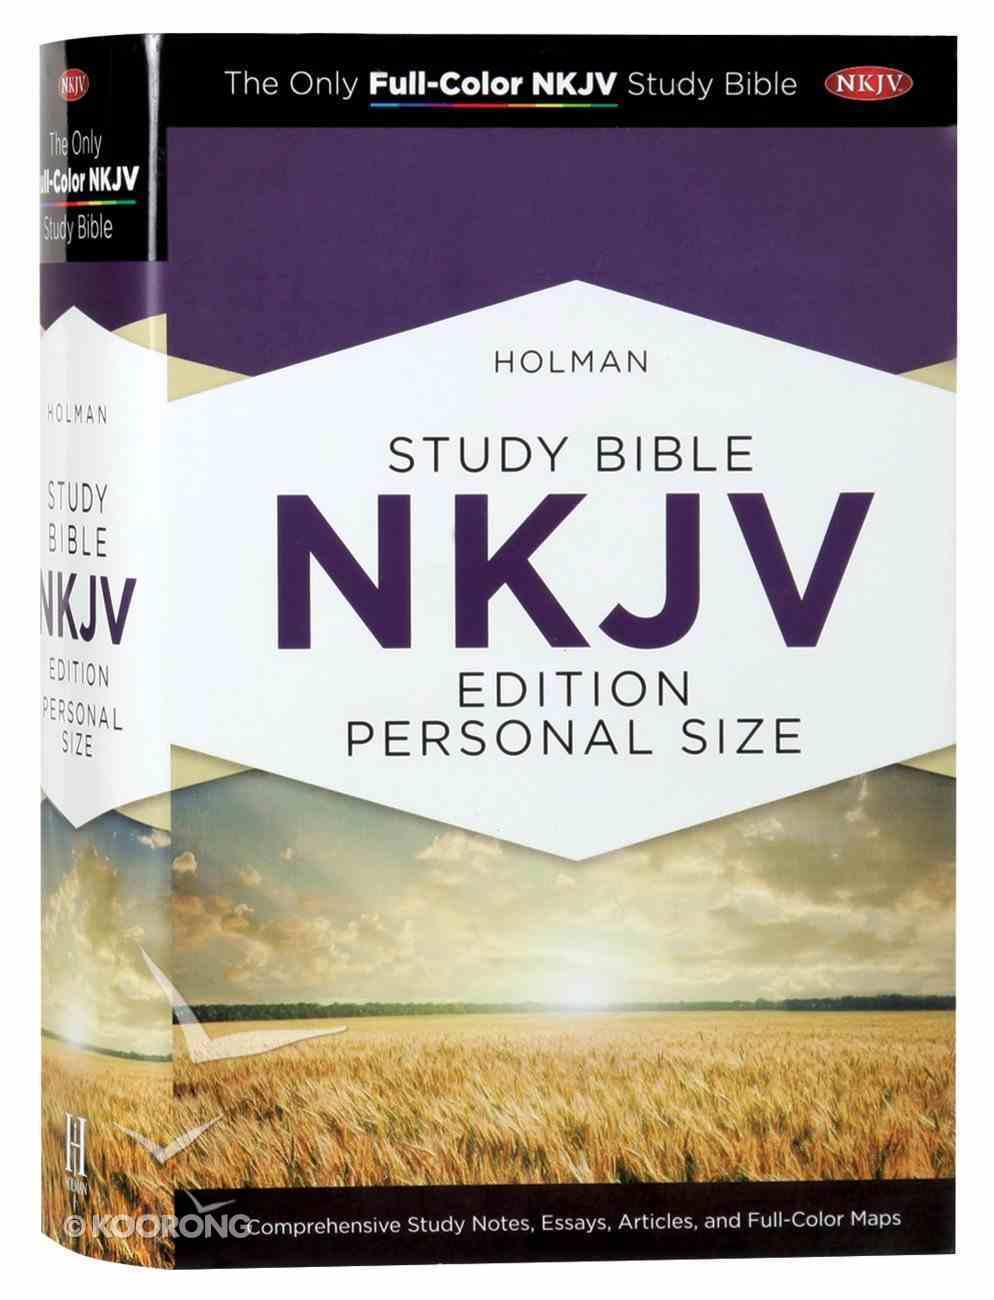 NKJV Holman Study Bible Personal Size Hardback